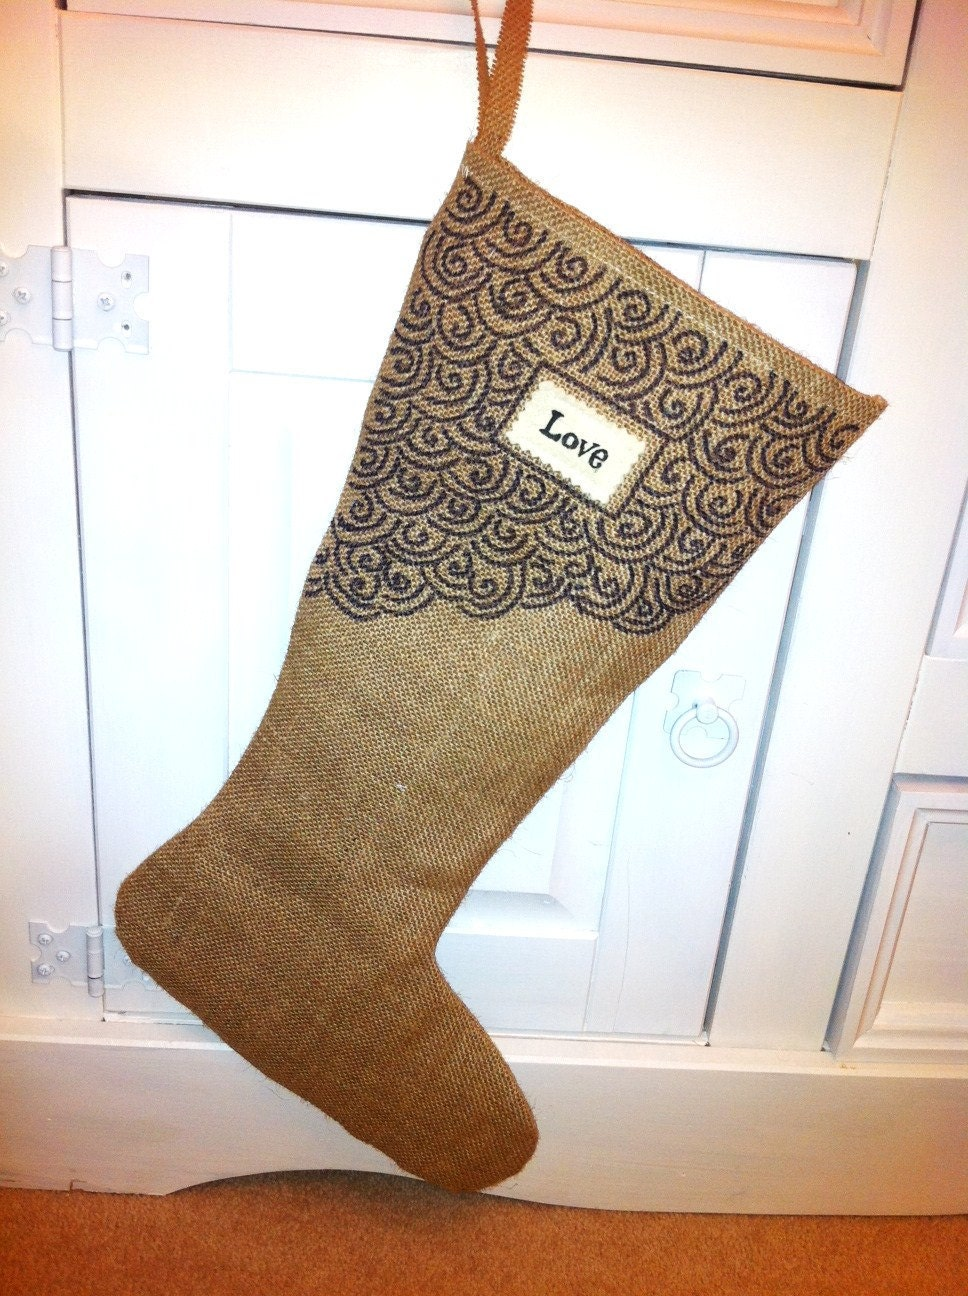 Custom LOVE Burlap Christmas Stocking - Unisex - Rustic Shabby Chic - Ecofriendly Christmas